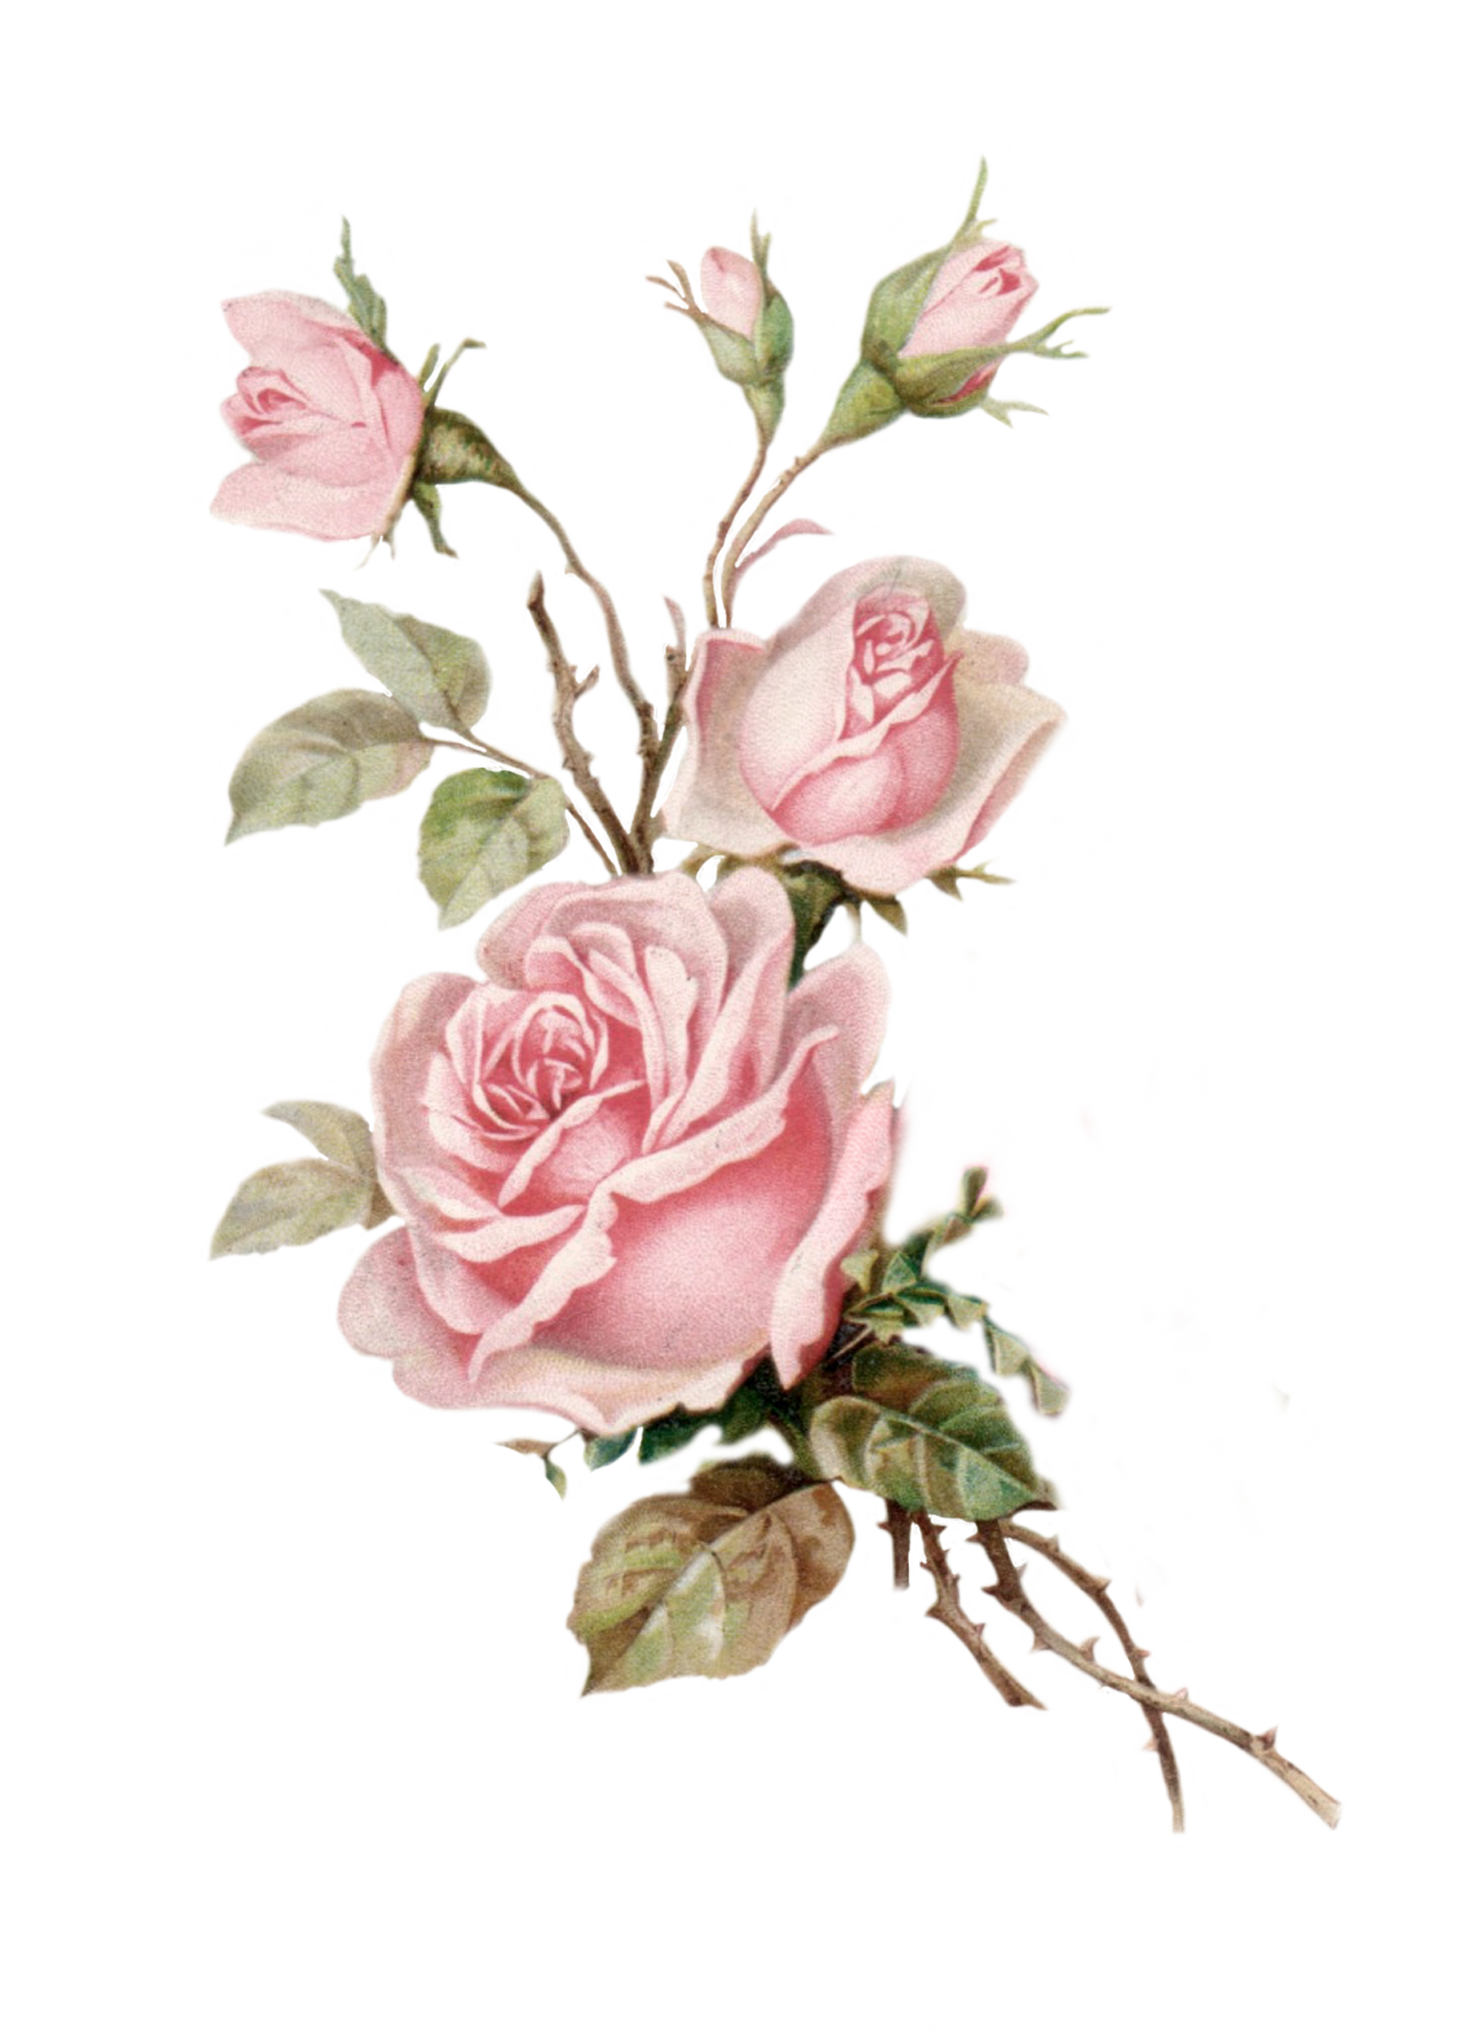 Spring Pink Rose Flower Bunch PNG Image